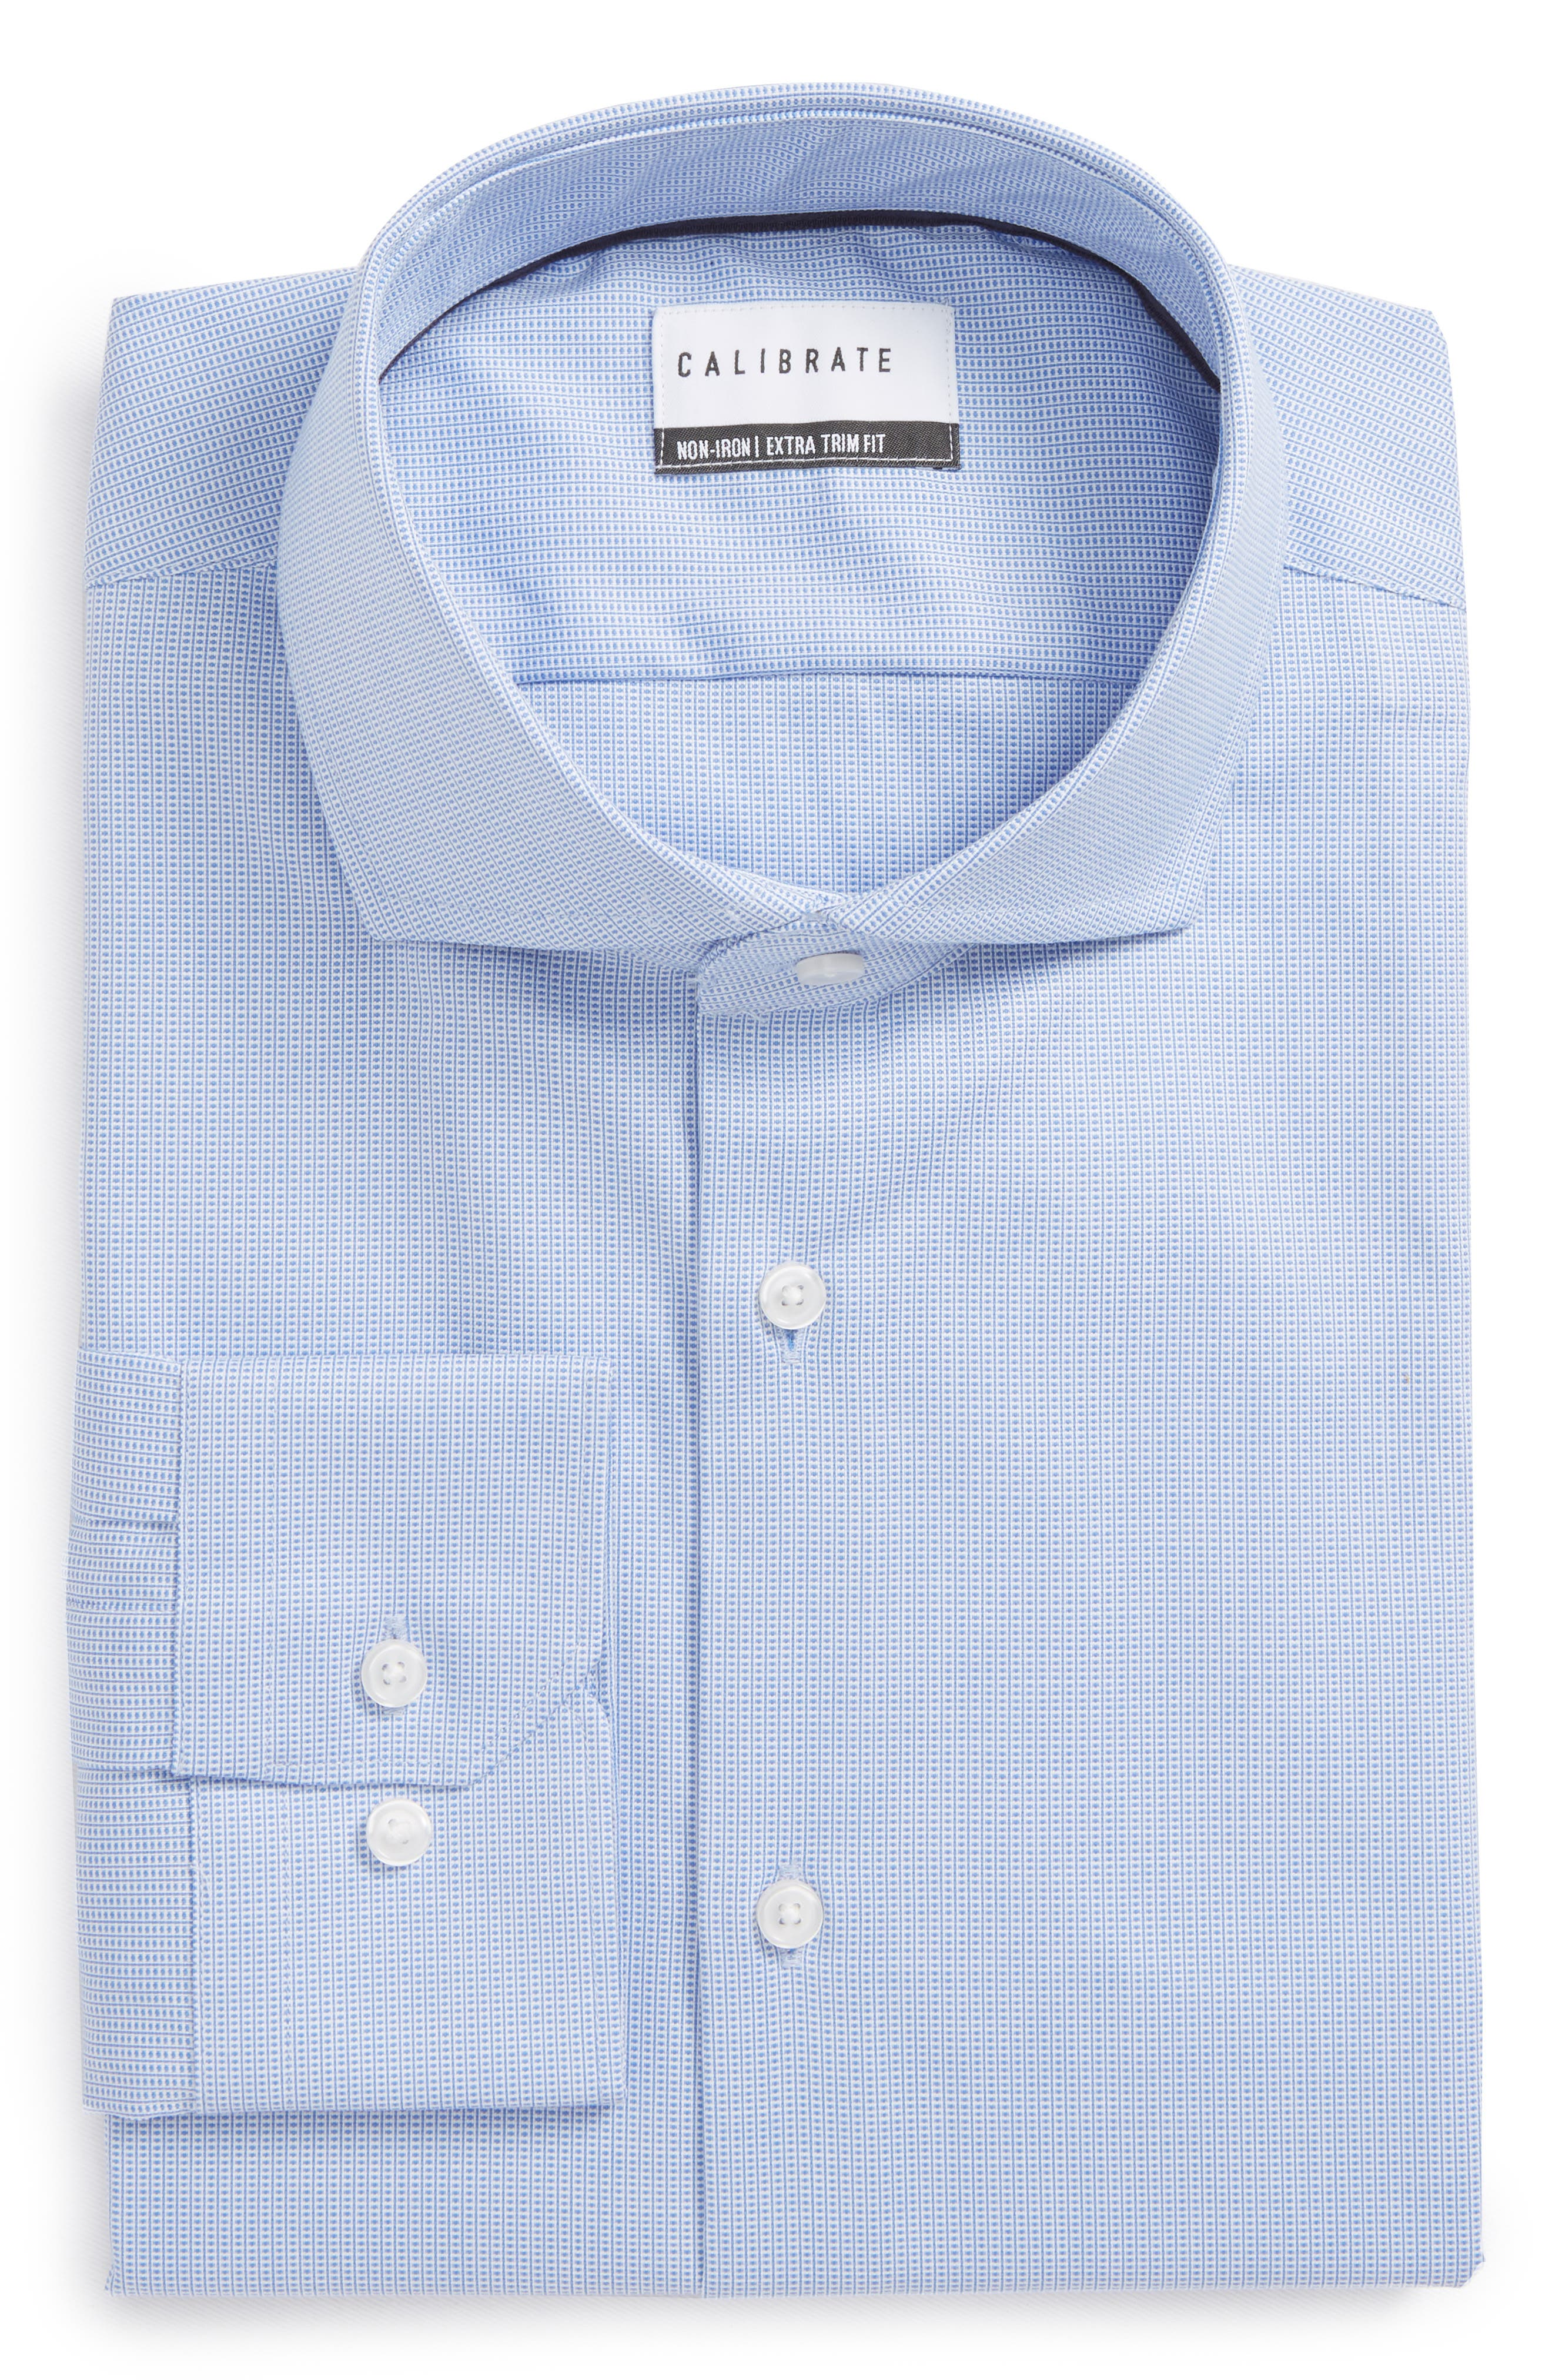 Extra Trim Fit Non-Iron Dress Shirt,                             Main thumbnail 1, color,                             Blue Azurite